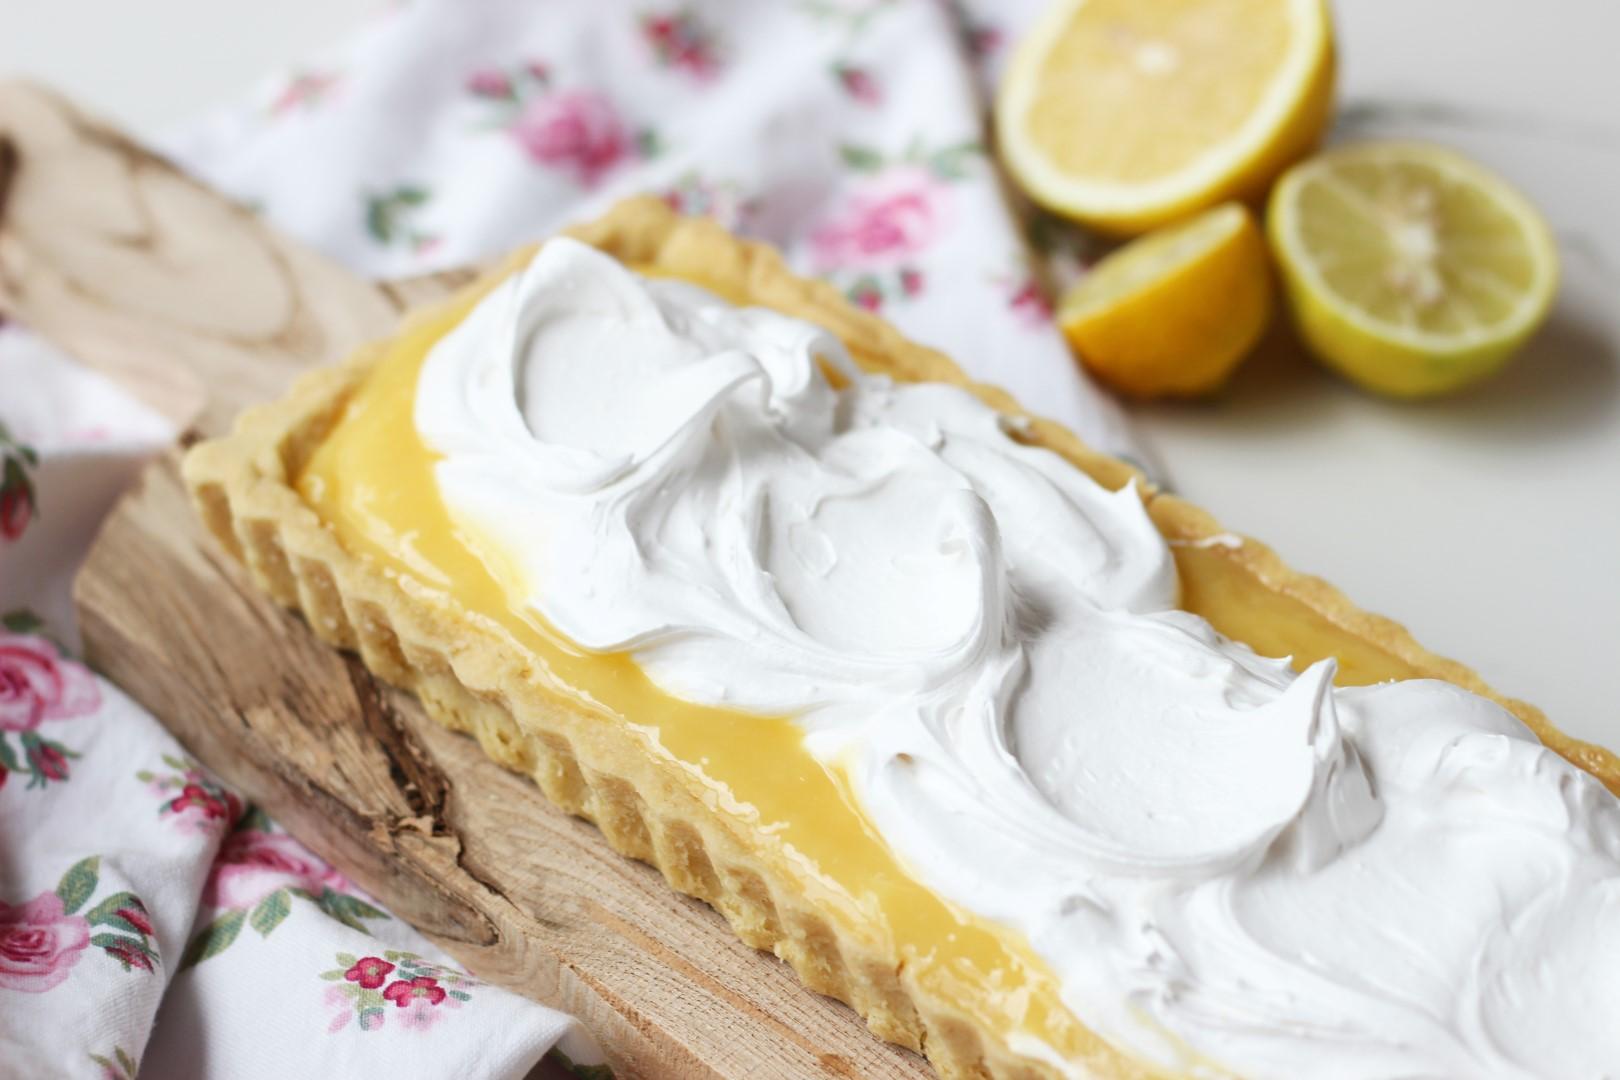 lemon pie, receta fácil, lemon curd, receta de cocina, postre.